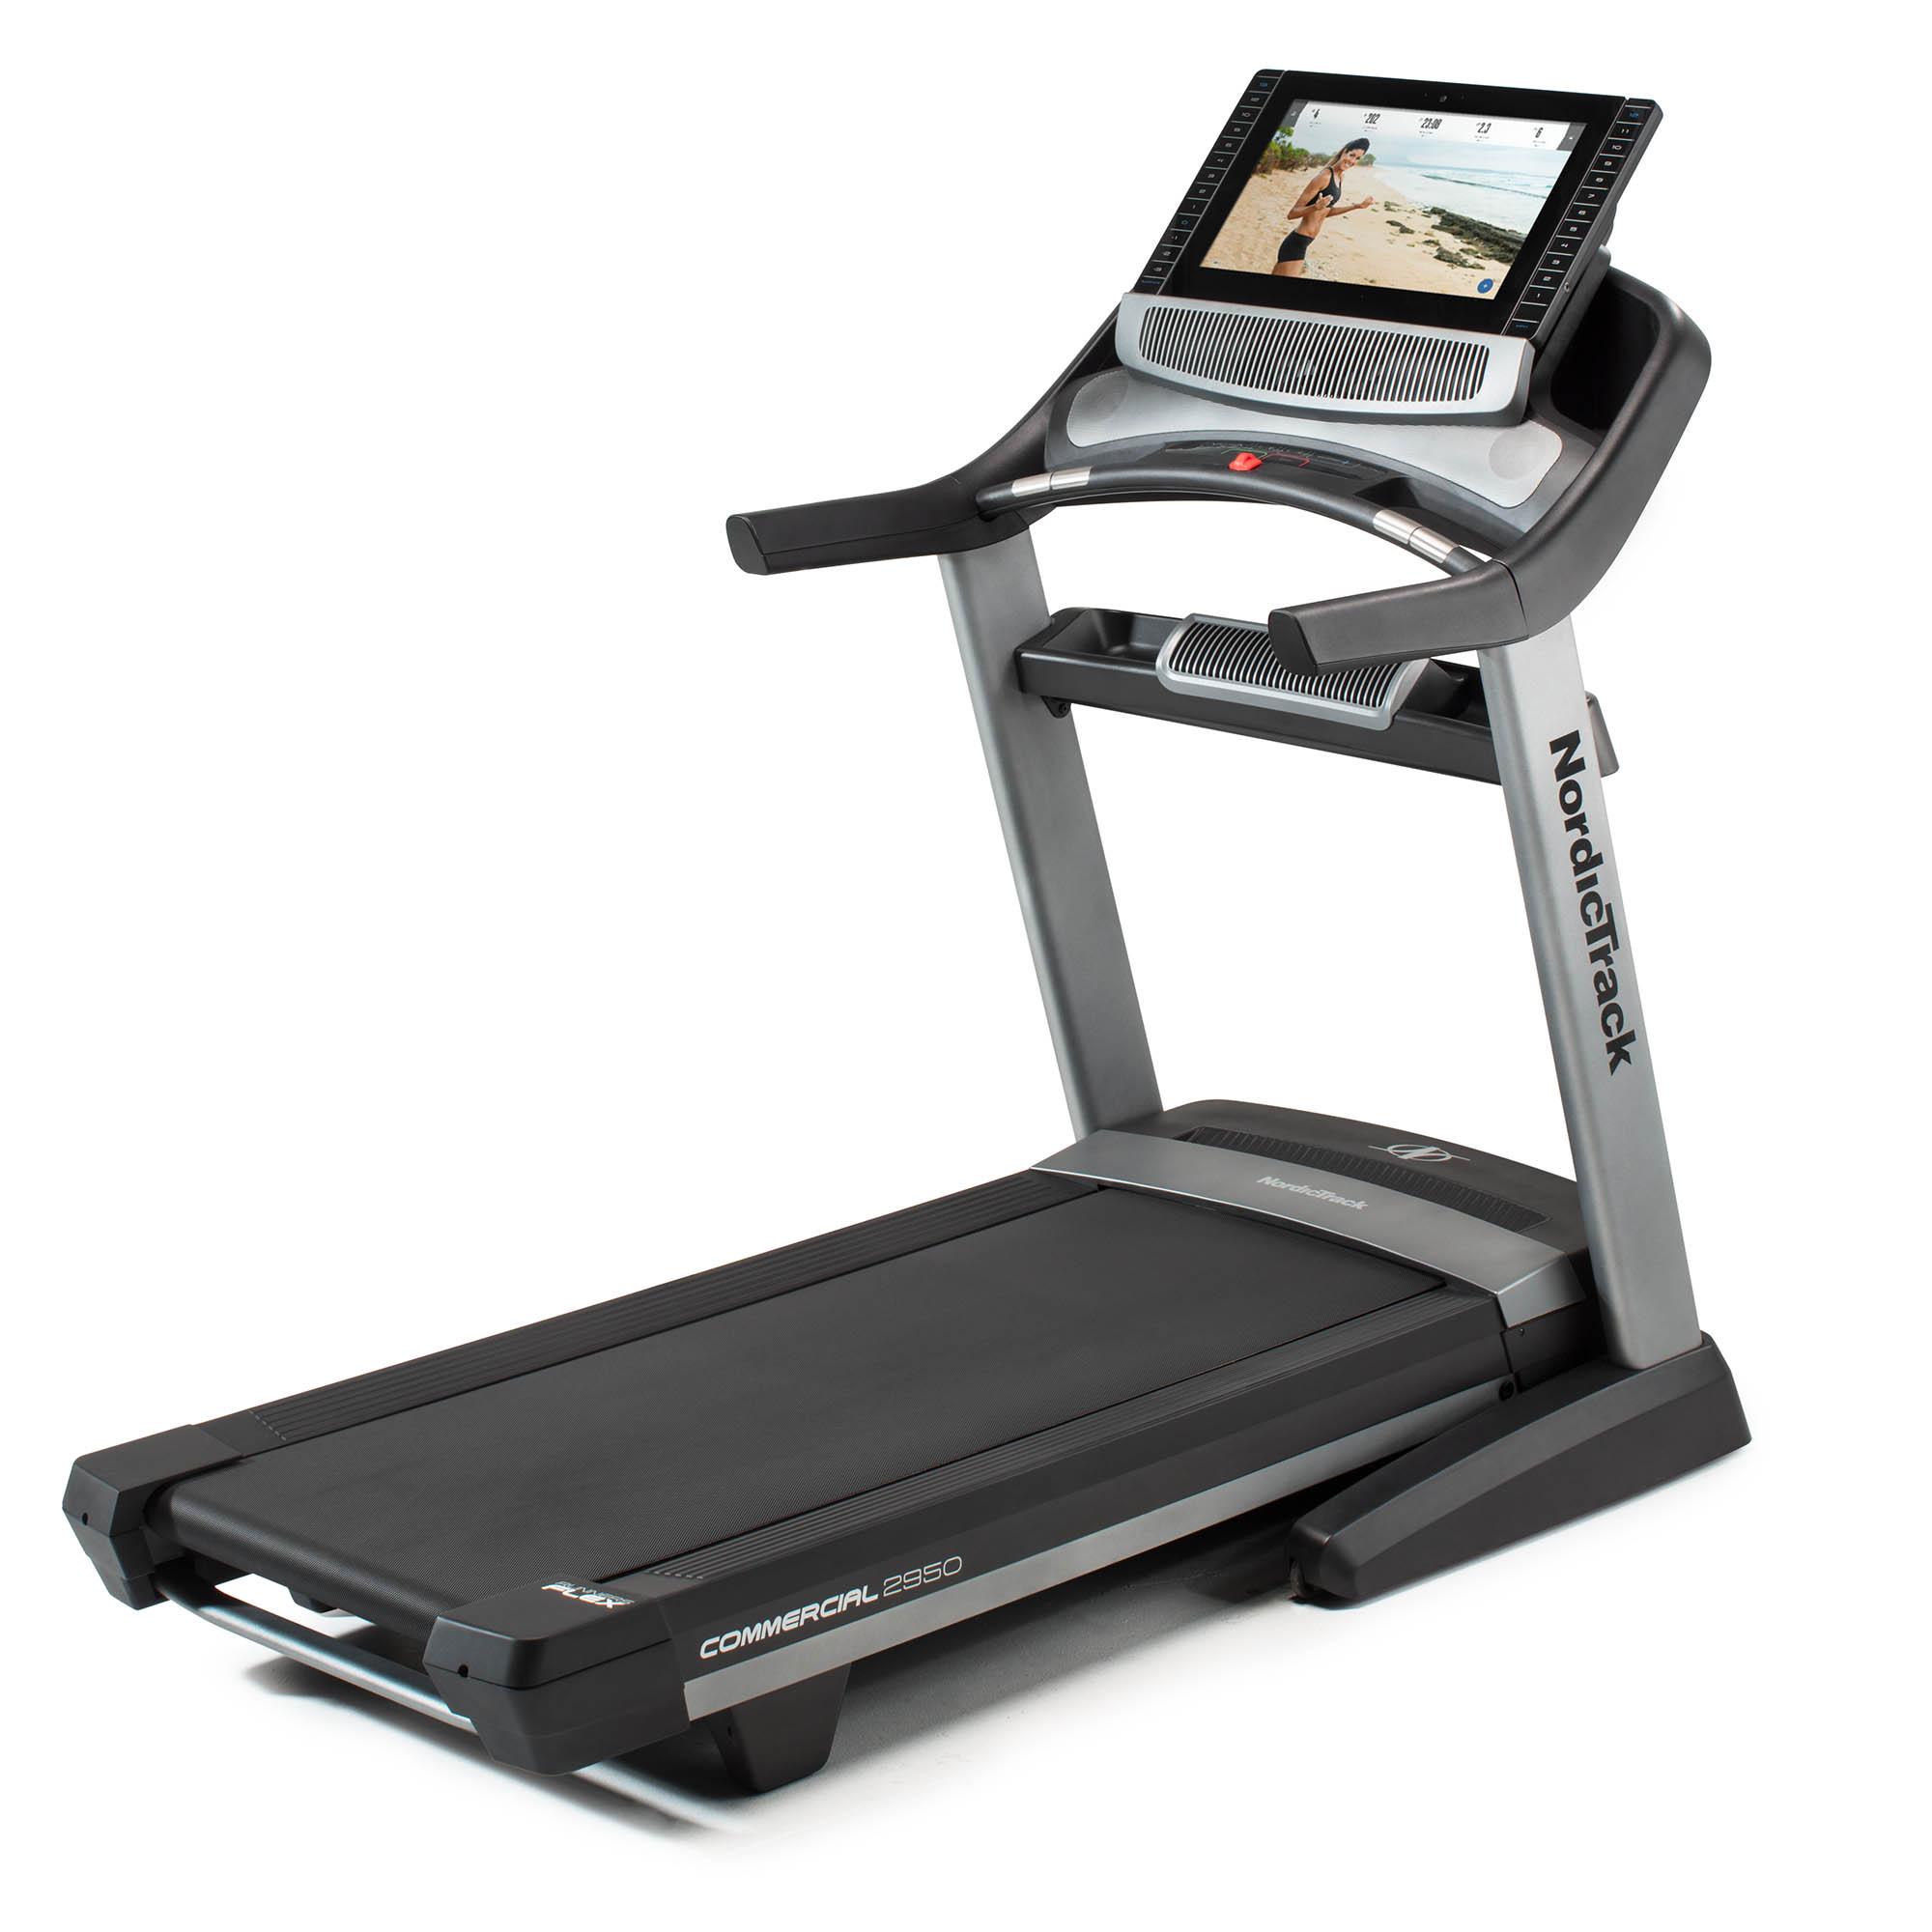 NordicTrack 2950C Folding Treadmill